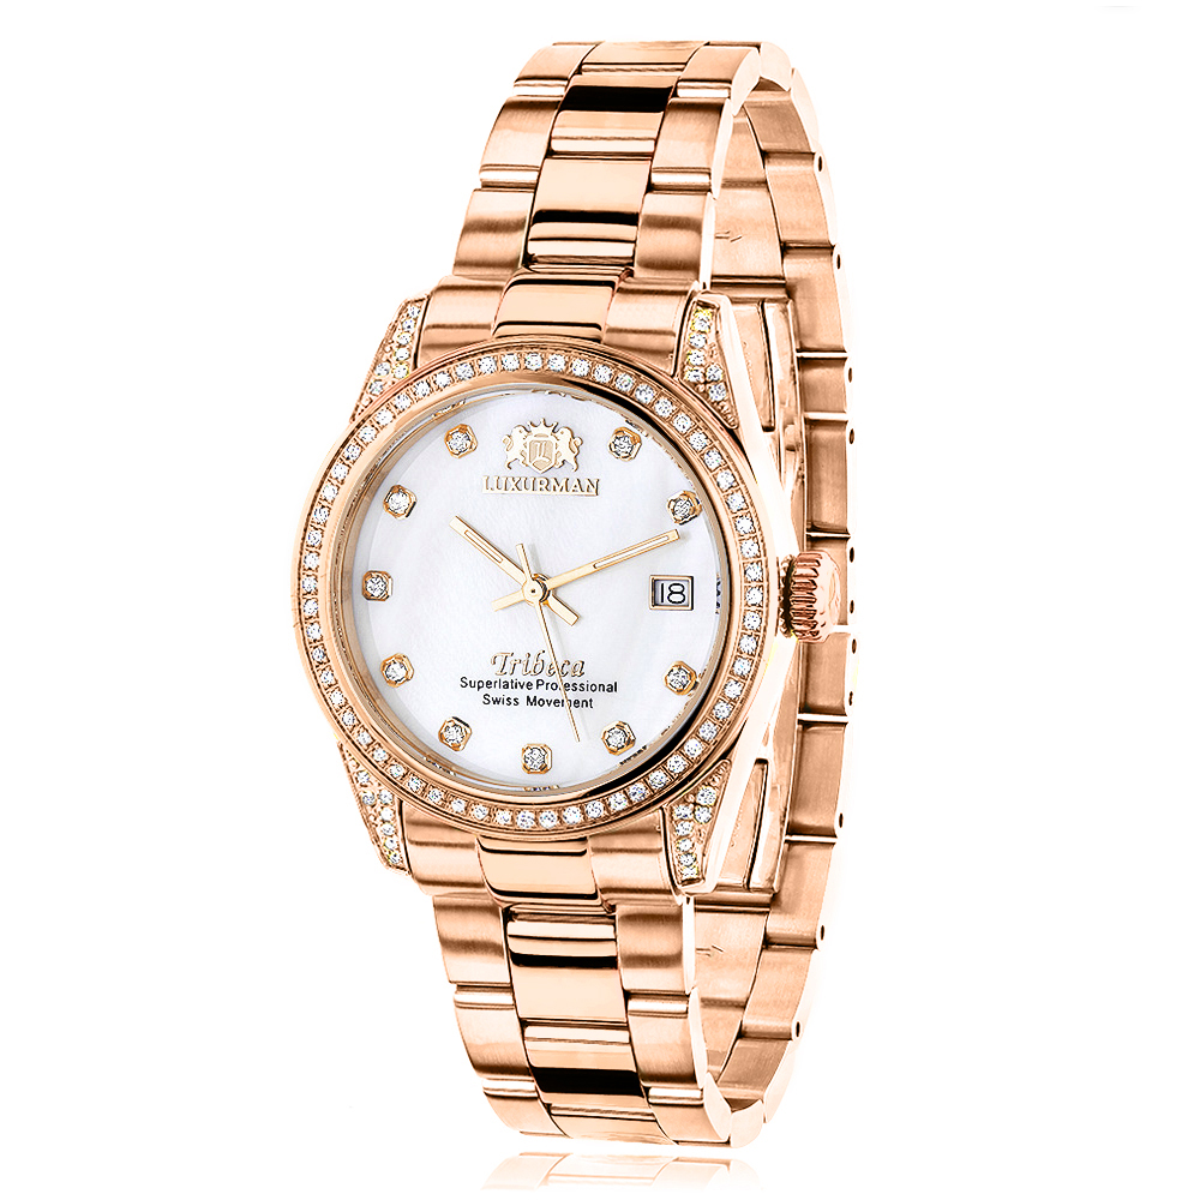 Luxurman Rose Gold Plated Diamond Watch for Women Tribeca Swiss Quartz